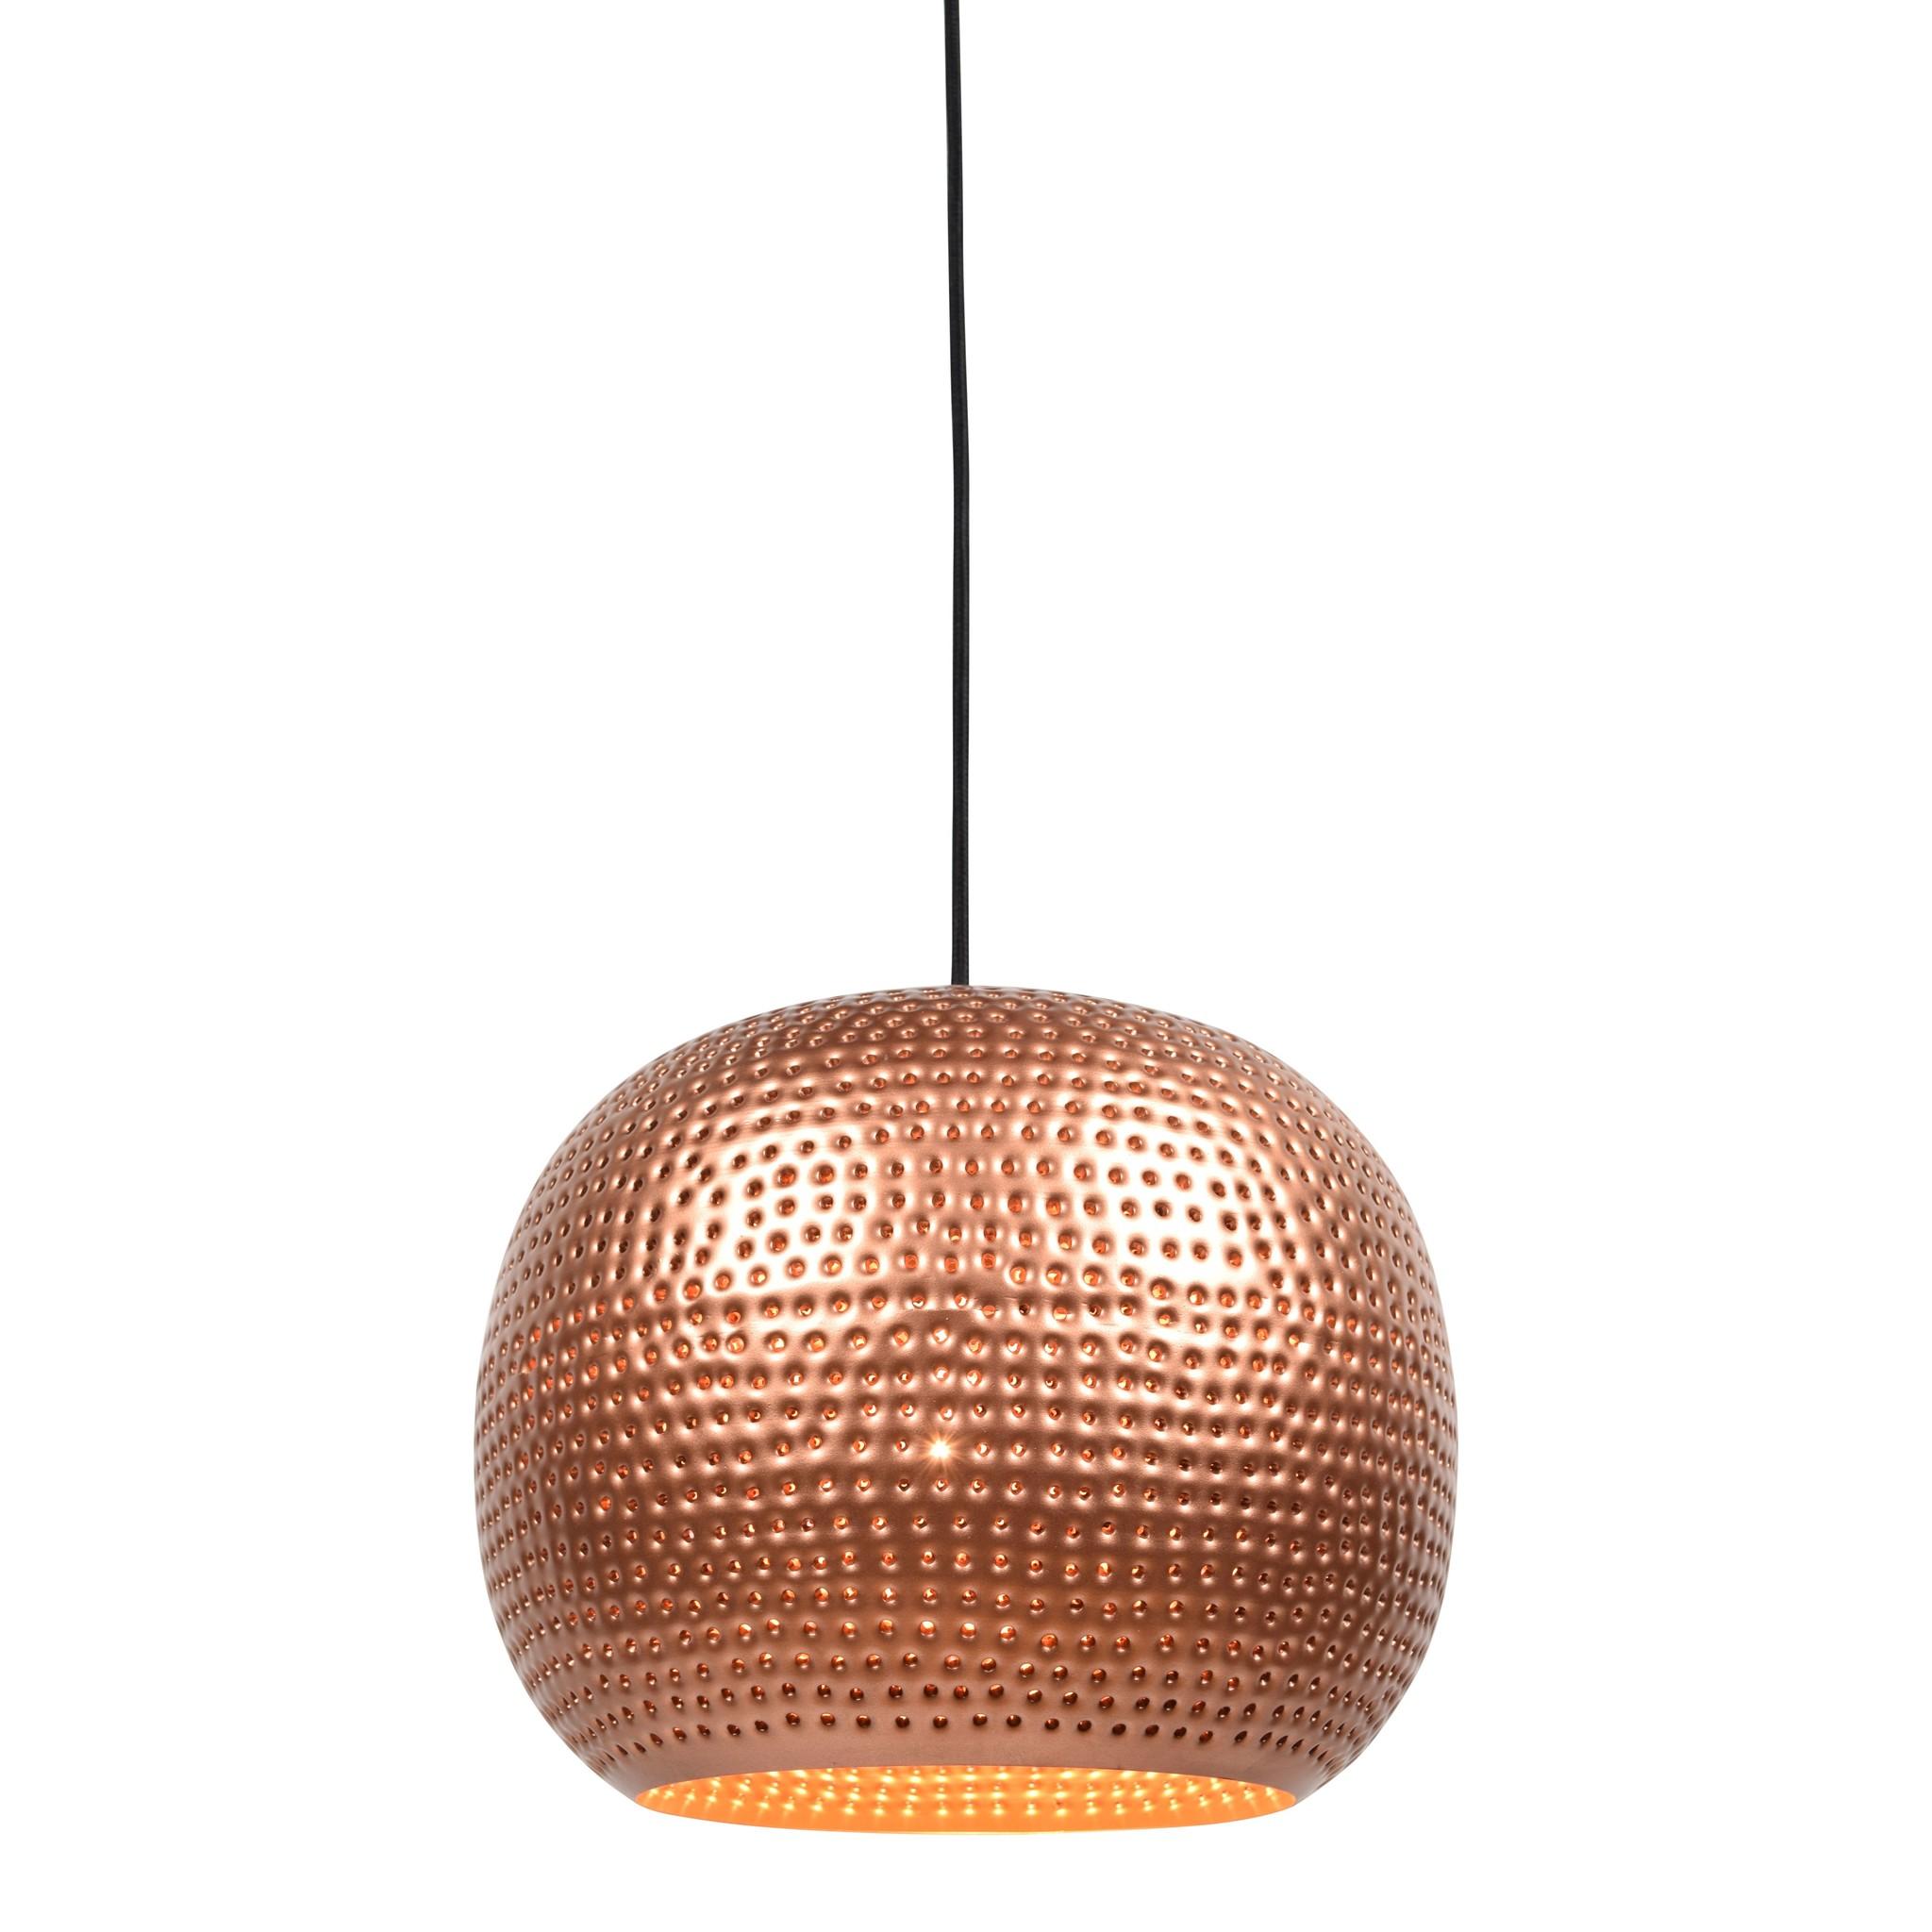 Urban Interiors Hanglamp Spike bol Ø 27 cm Koper